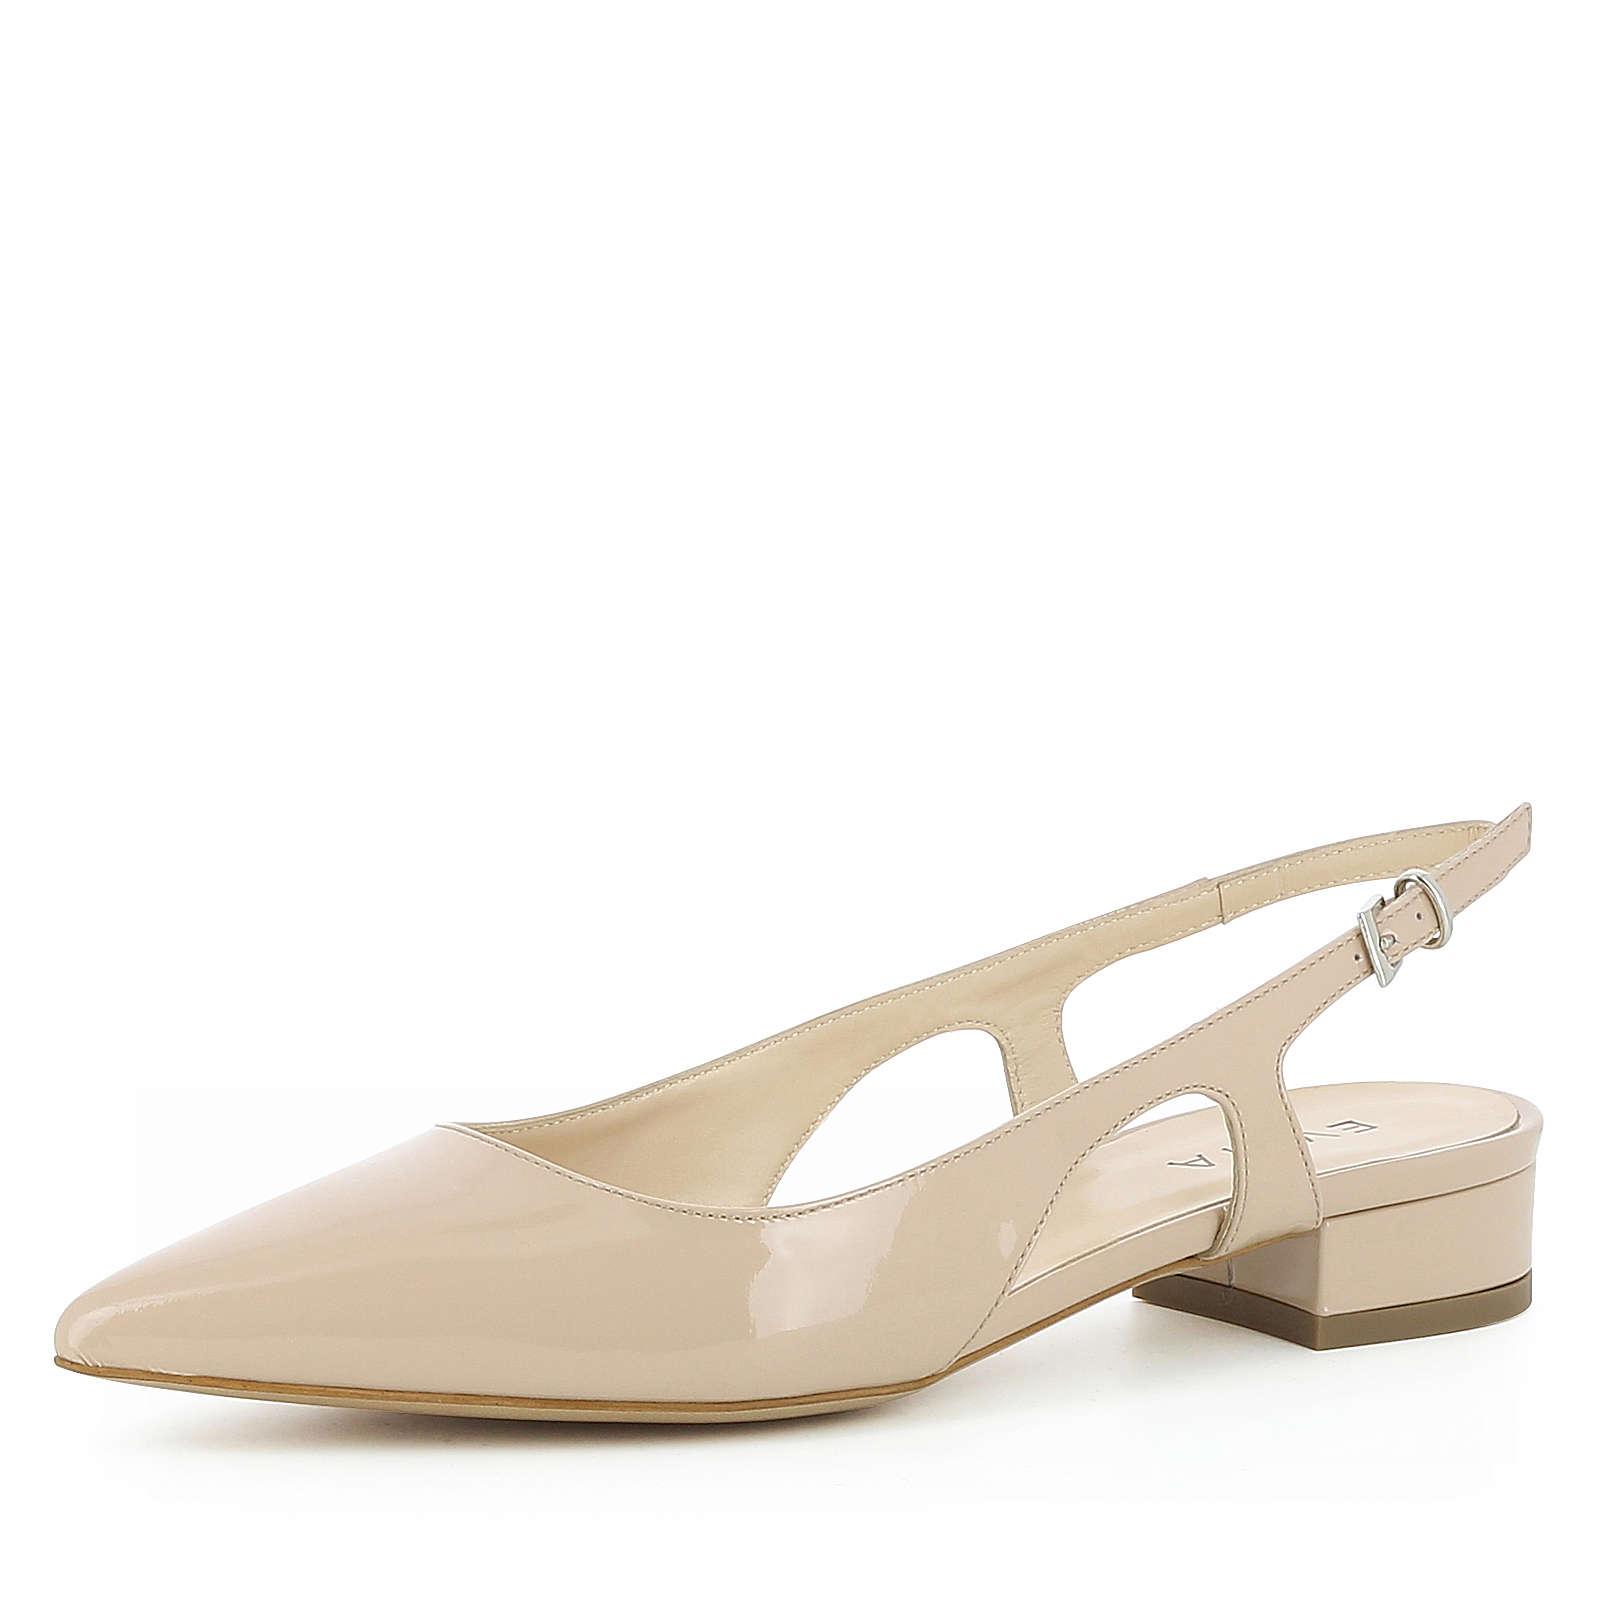 Evita Shoes Damen Sling Pumps FRANCA Komfort-Pumps nude Damen Gr. 34